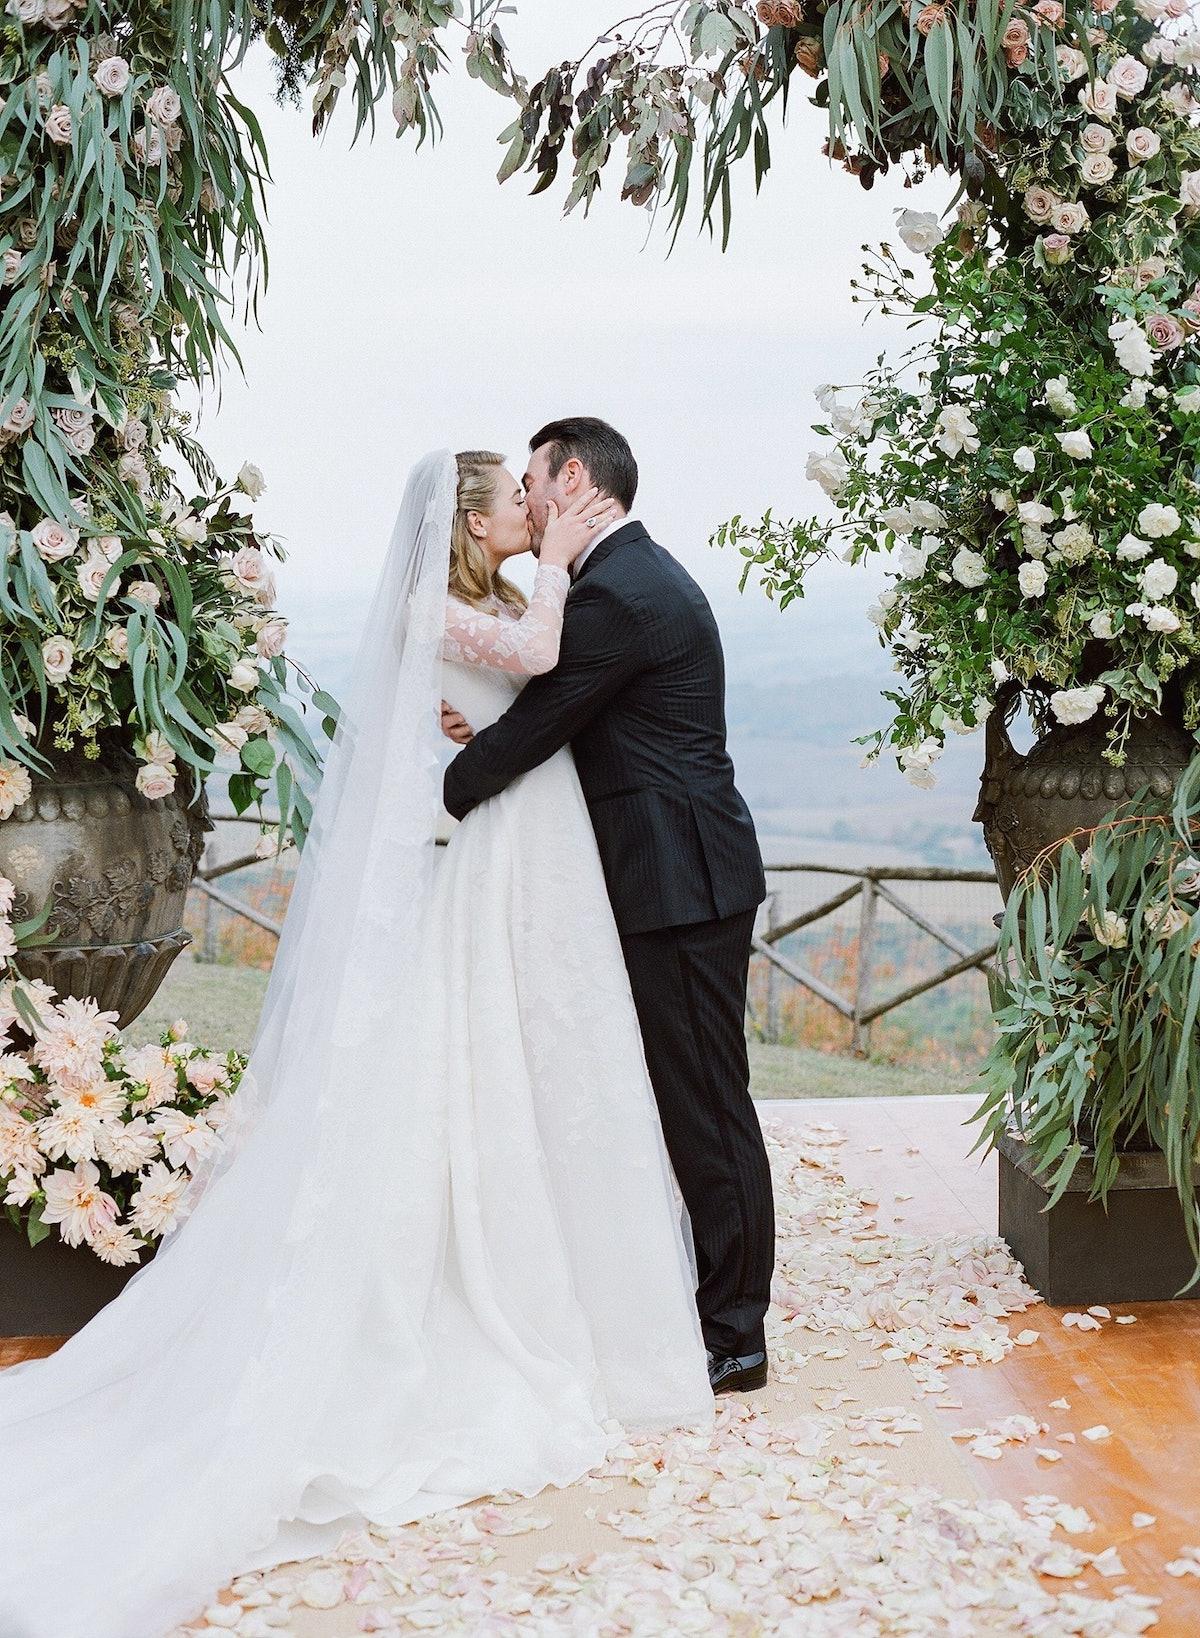 Kate Upton and Justin Verlander Wedding, Ceremony